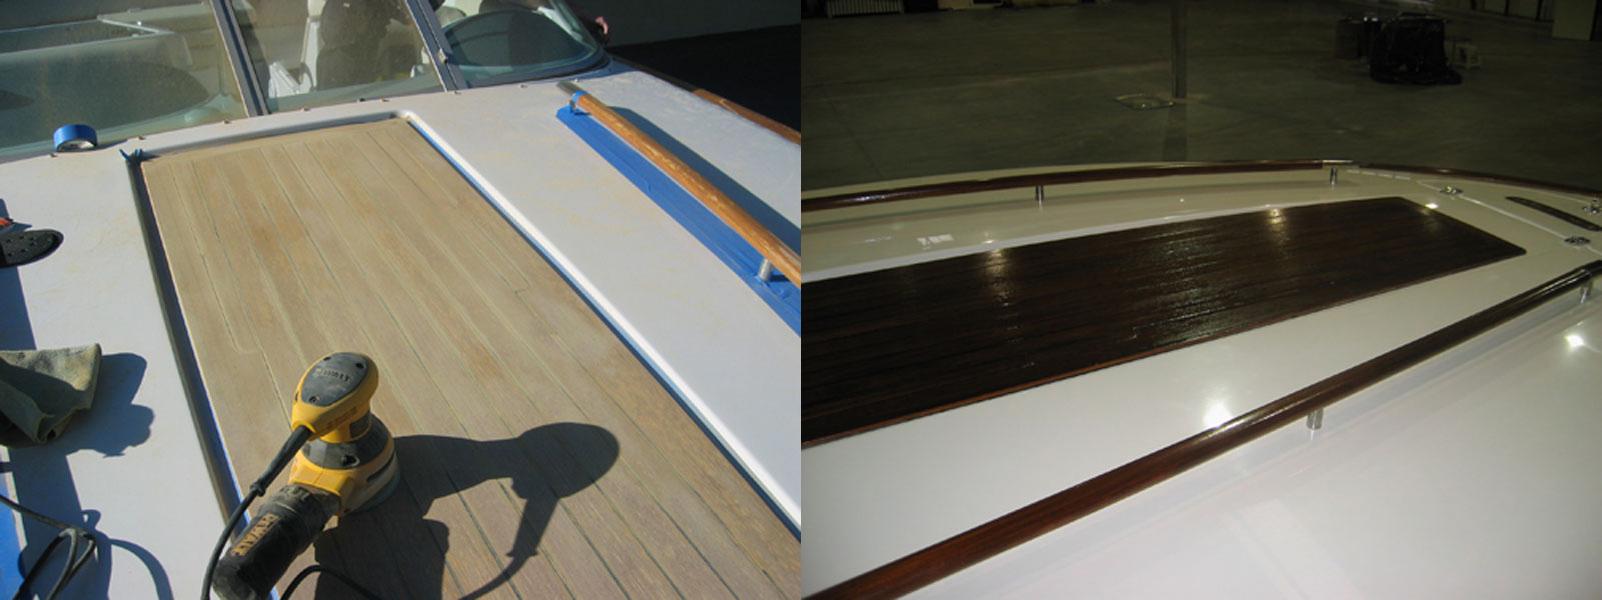 11_Boat.jpg